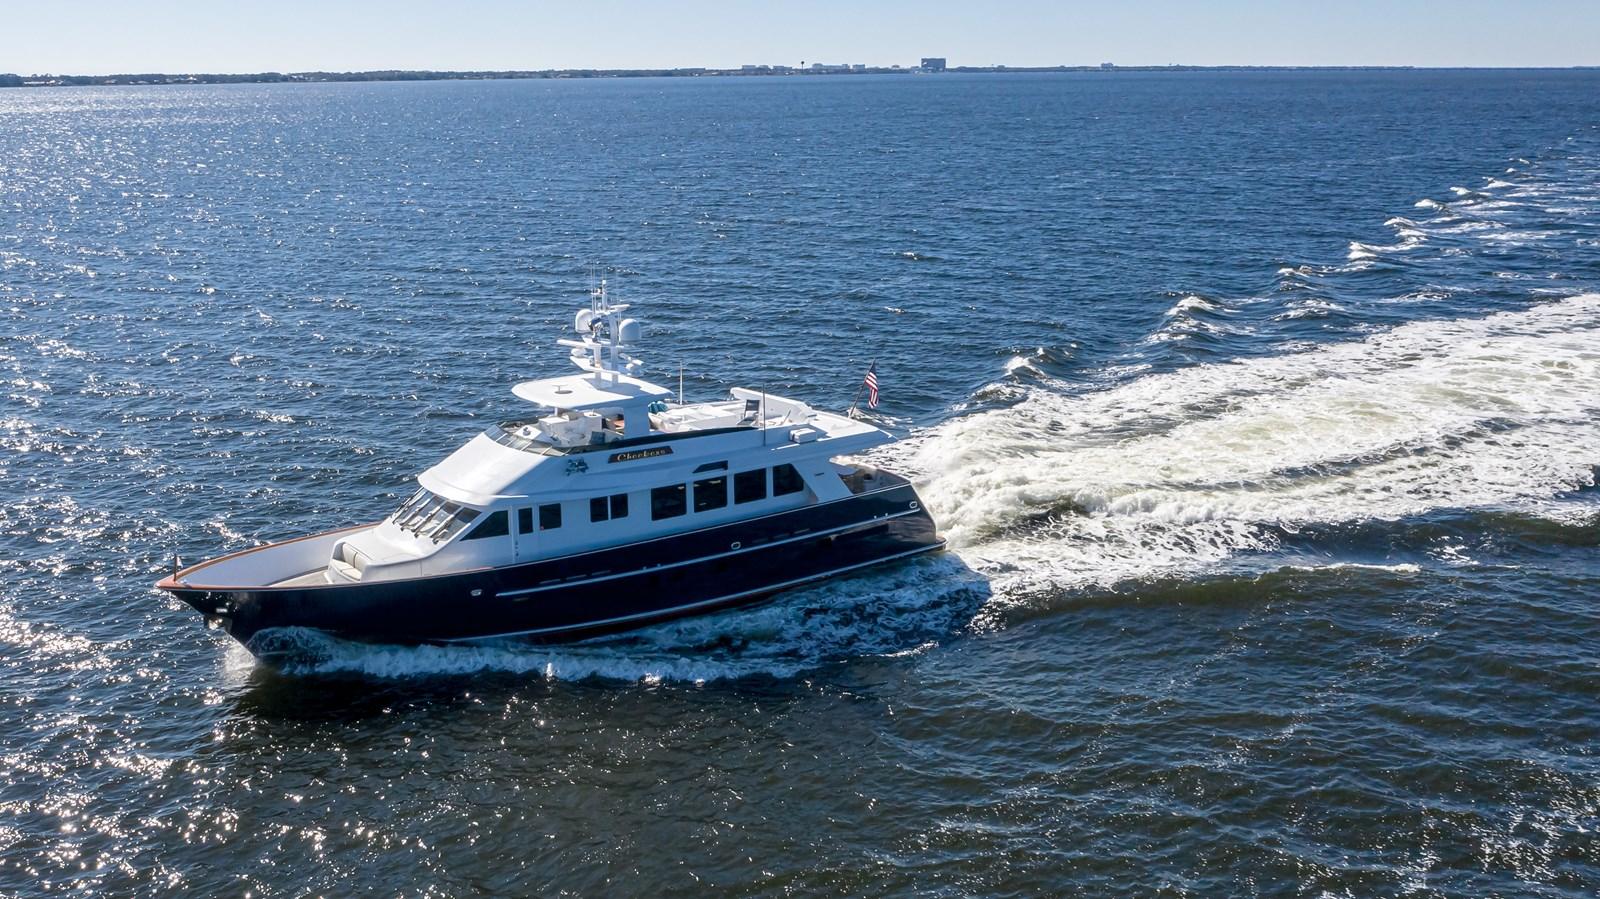 2011 85 Burger - Port Profile Running 2001 BURGER 85 Motor Yacht Motor Yacht 2847229